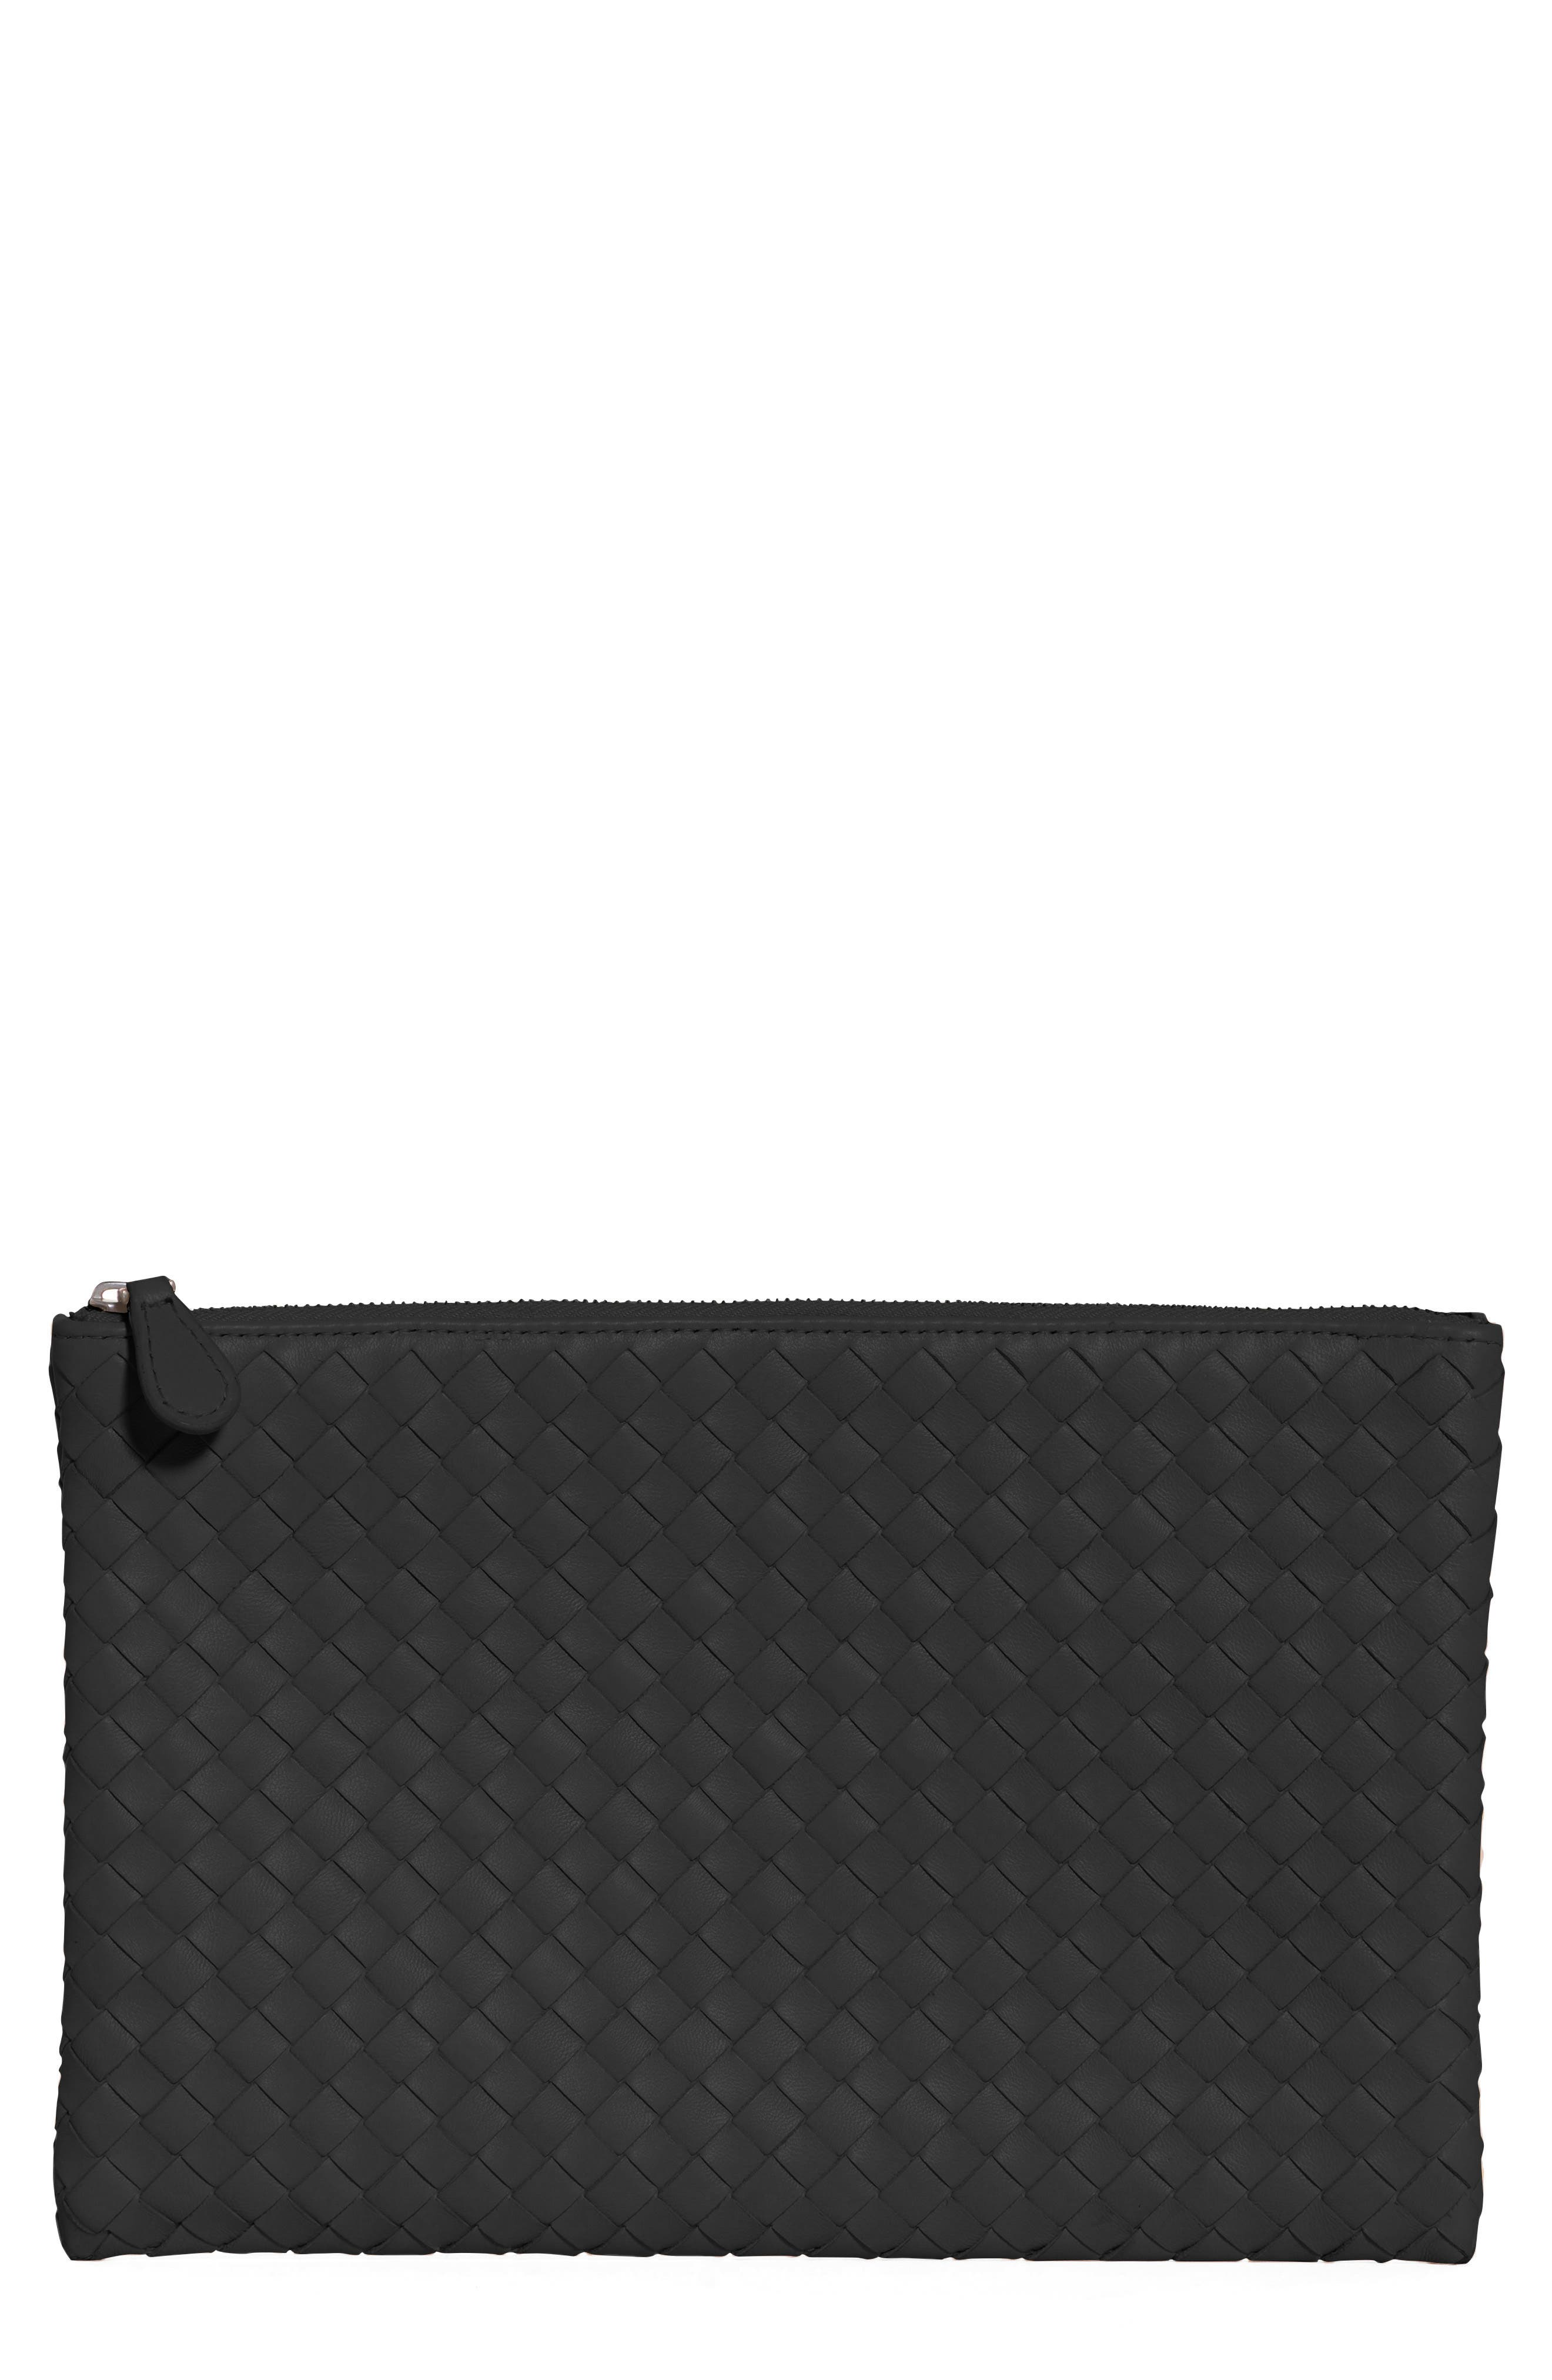 Bottega Veneta Intrecciato Large Leather Pouch